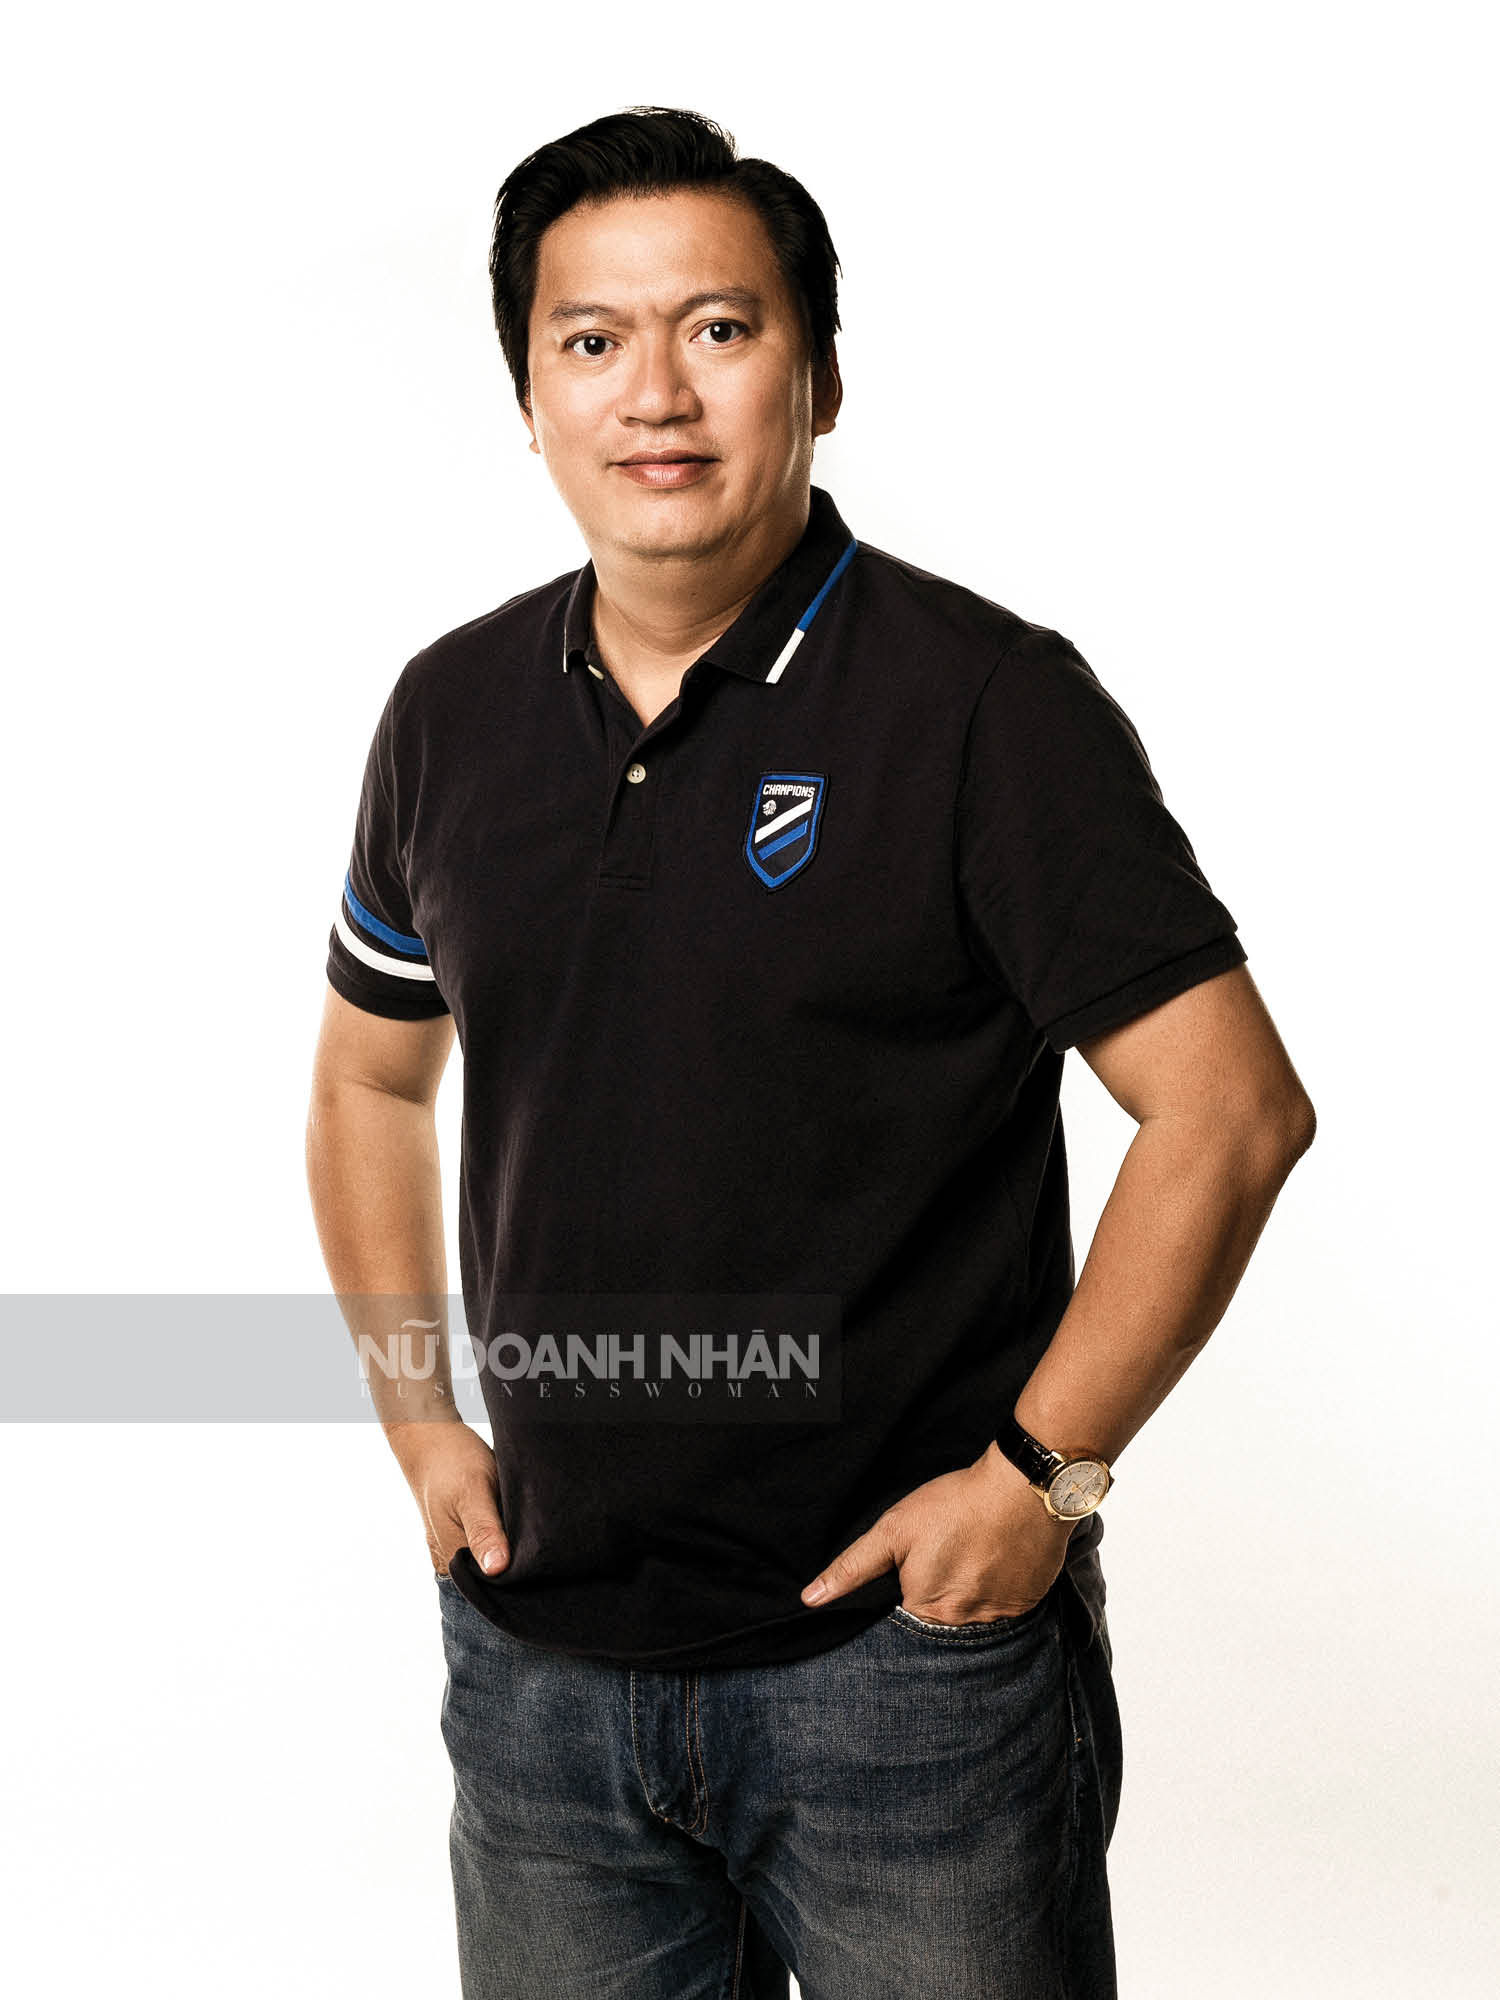 Phong van Founder CEO Saigon Books nguyen tuan quynh